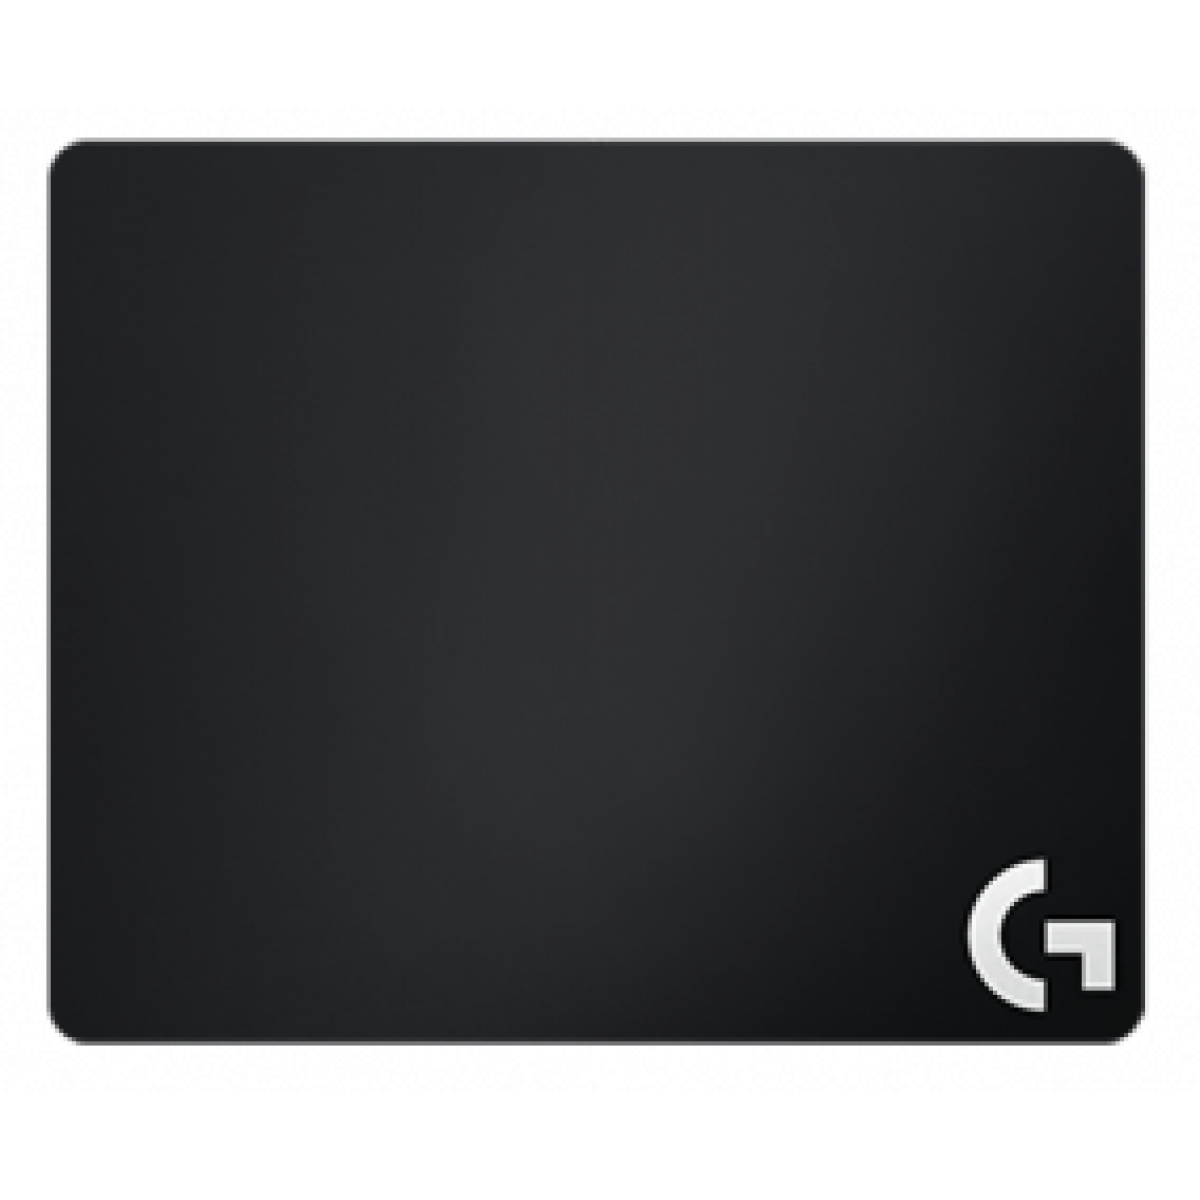 Mousepad Gamer Logitech G240 Cloth, 943-000093